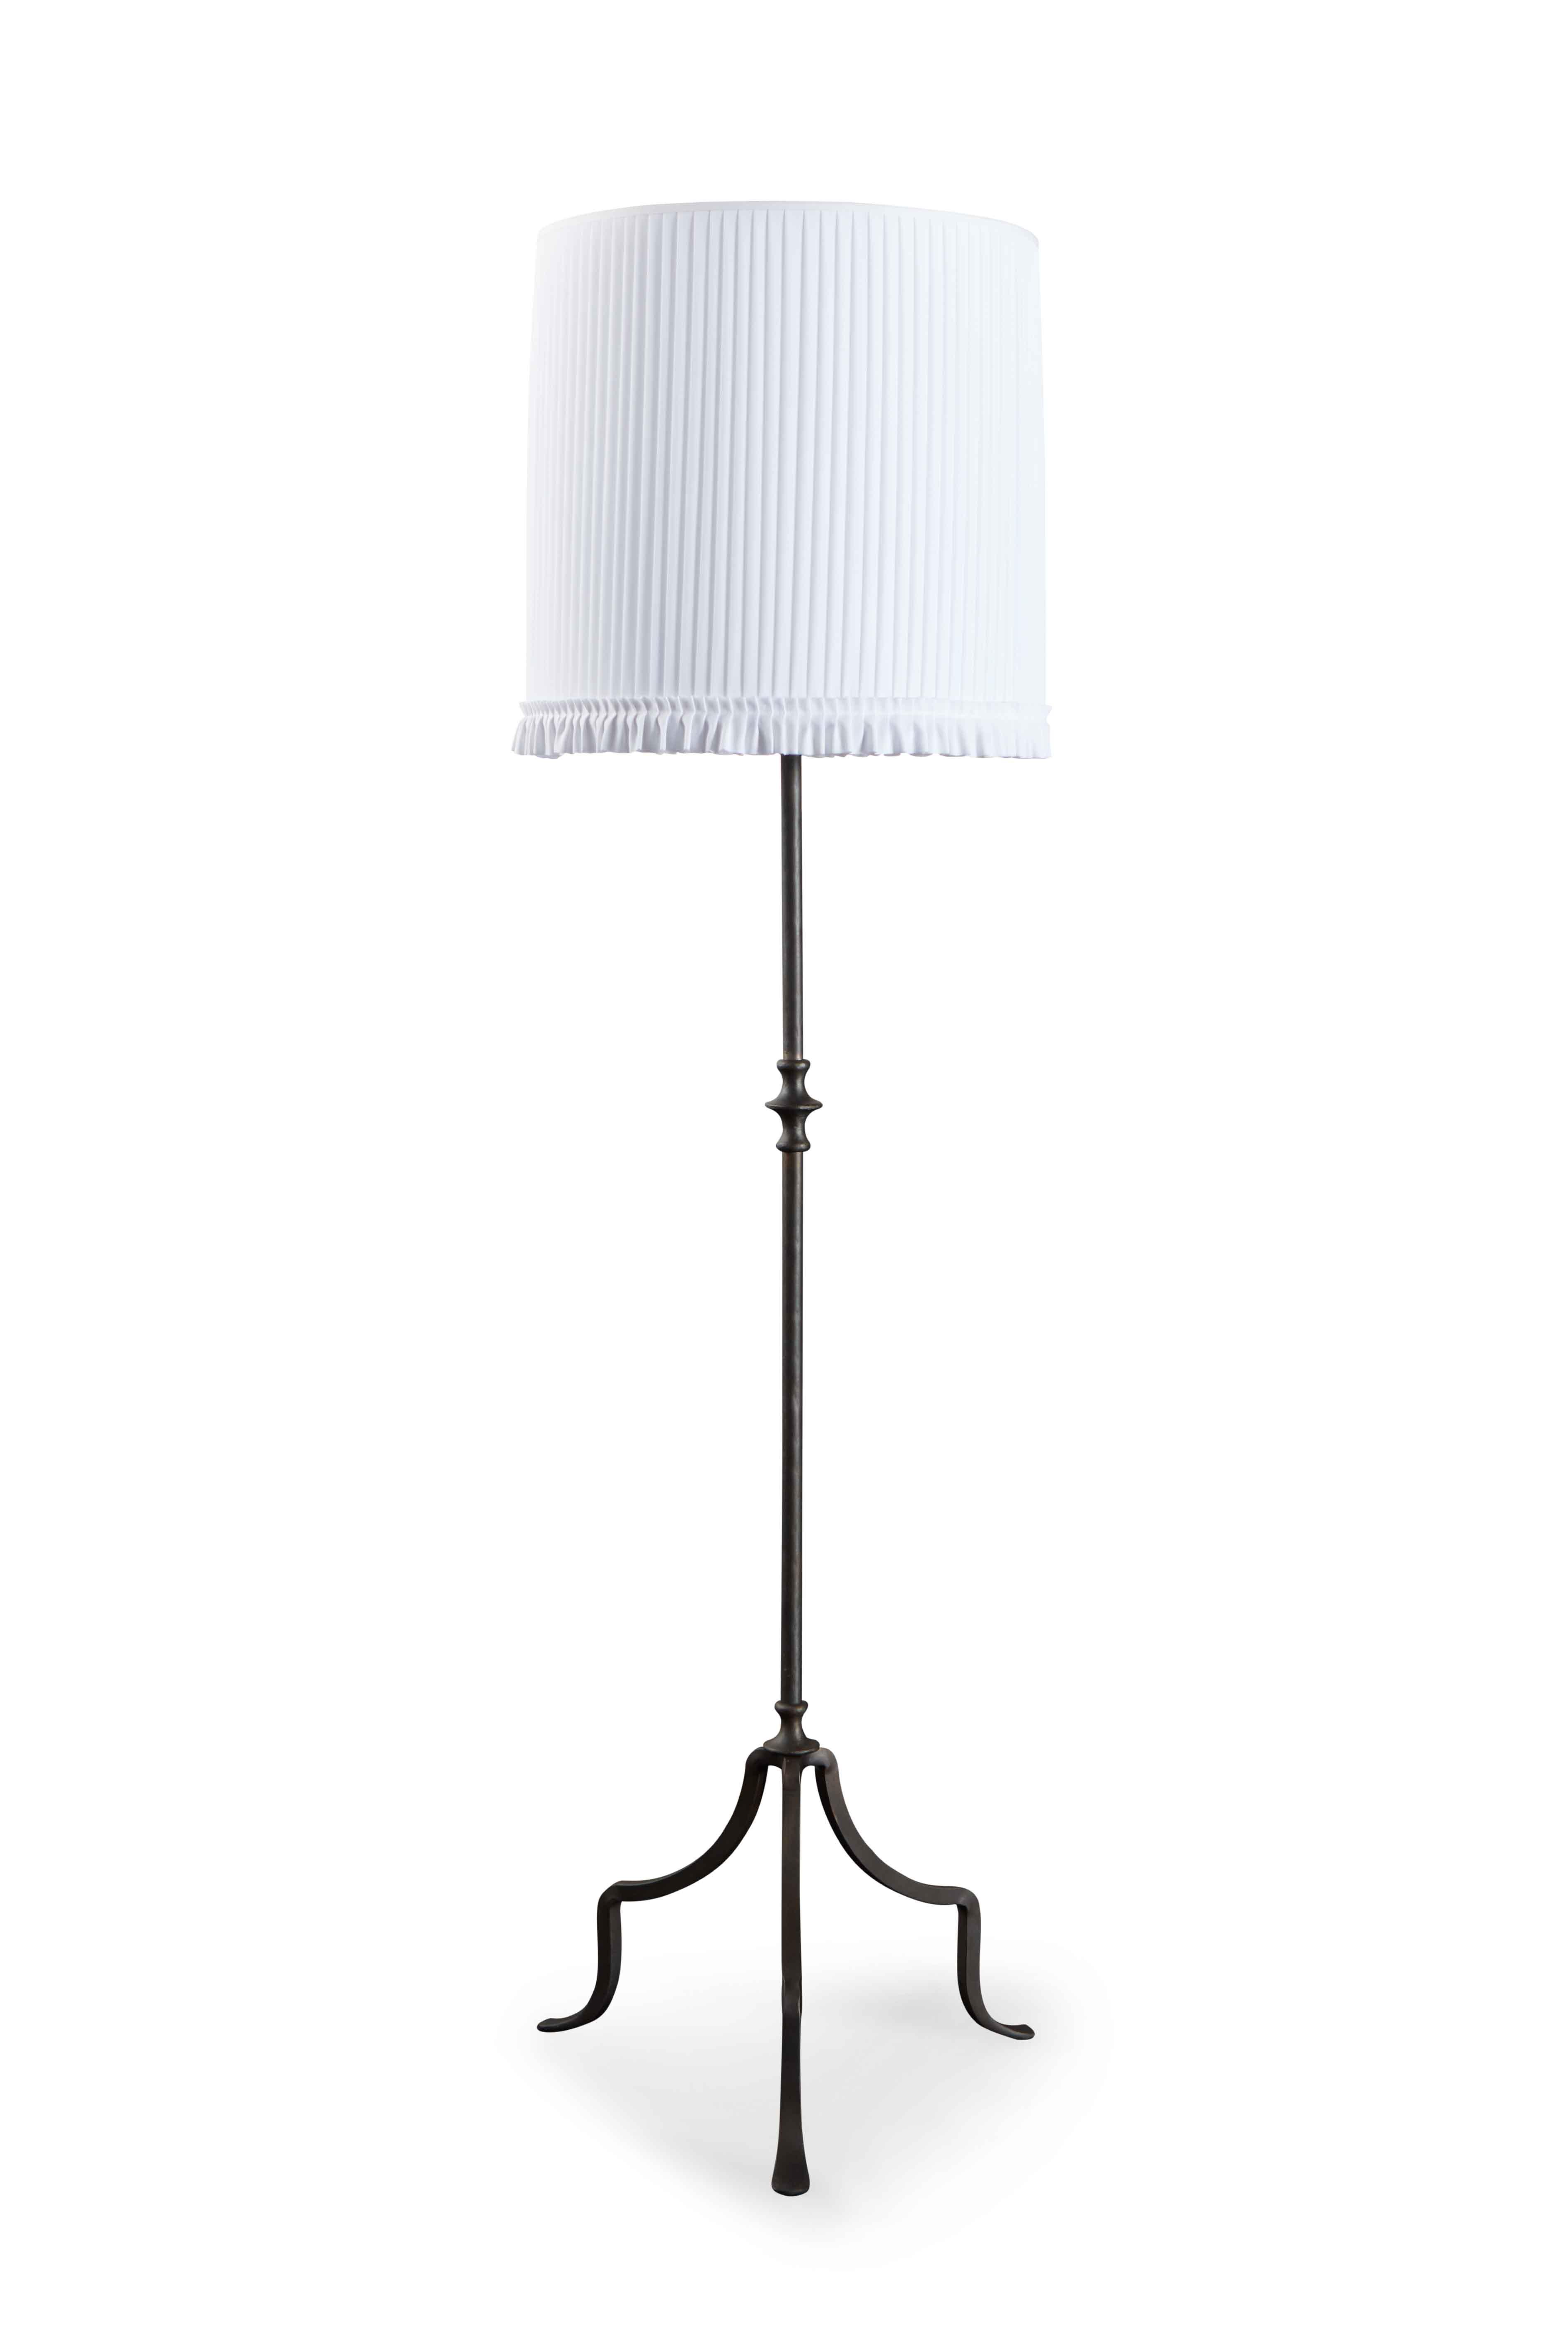 Baker Furniture floor lamp